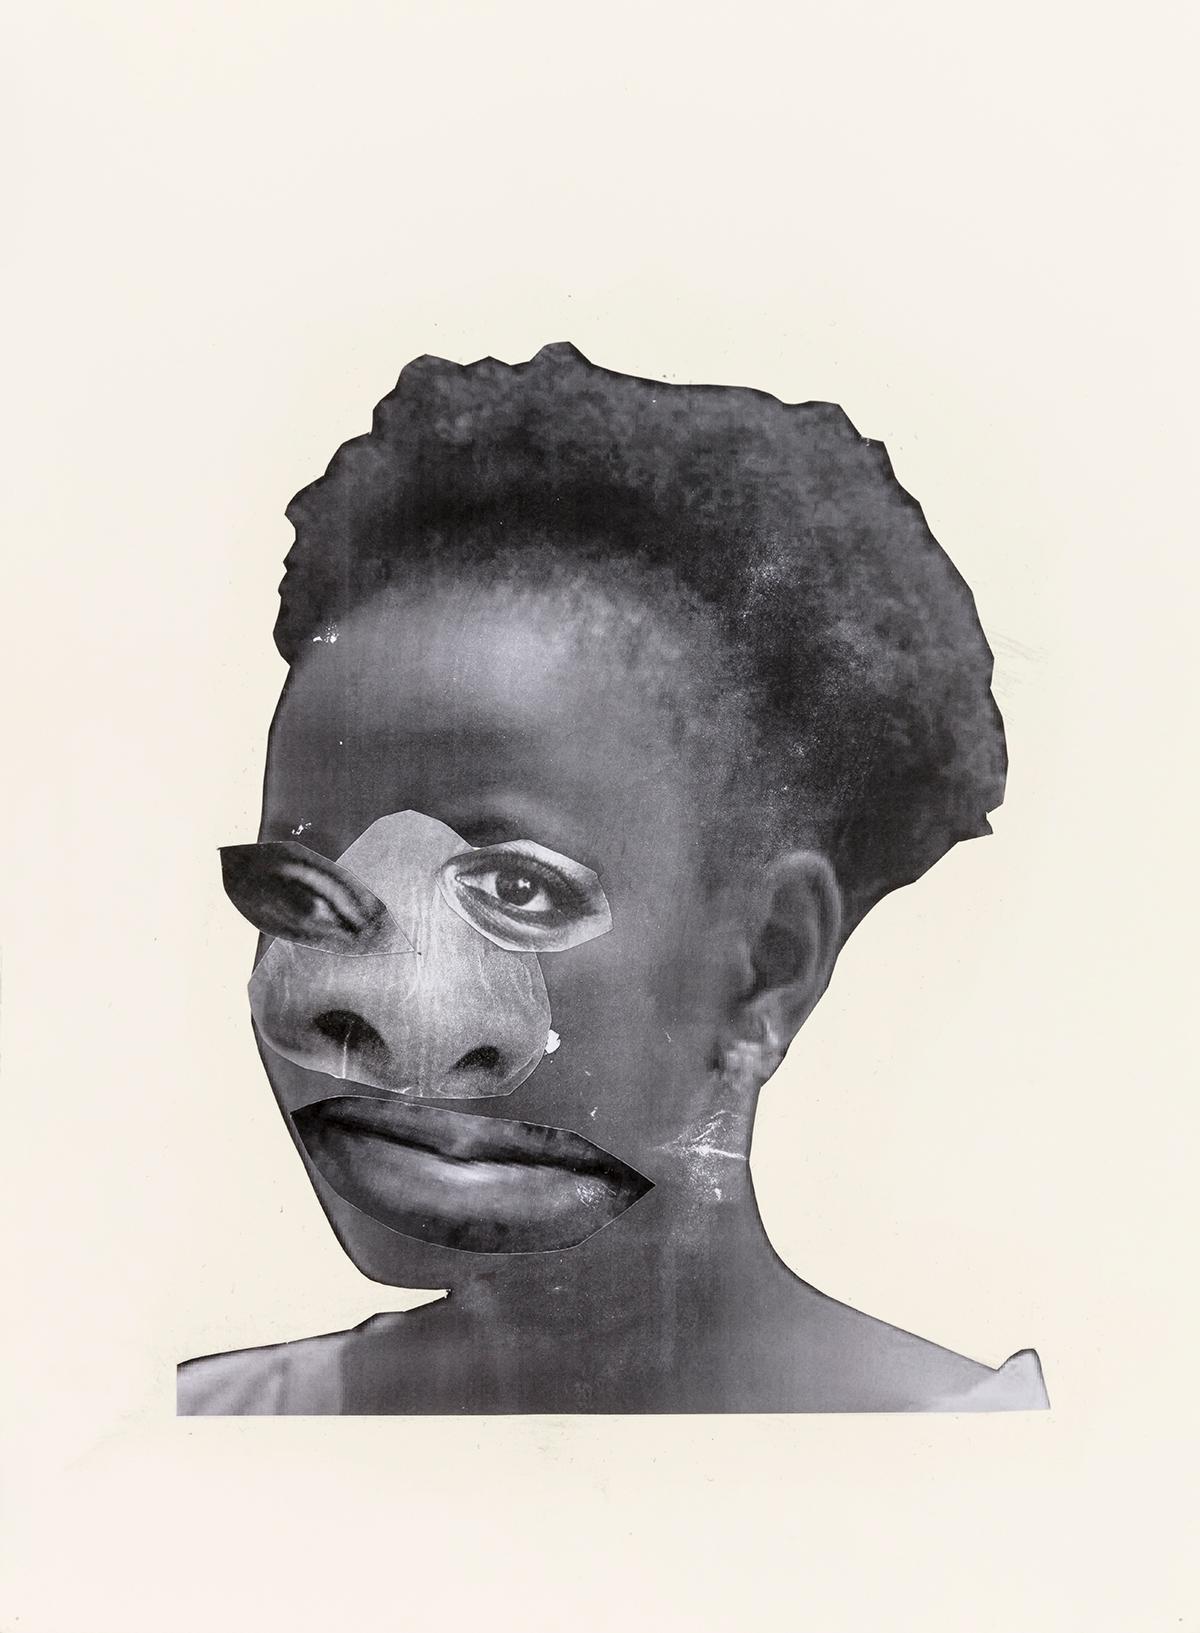 Neo Matloga - Black Collages, 2018